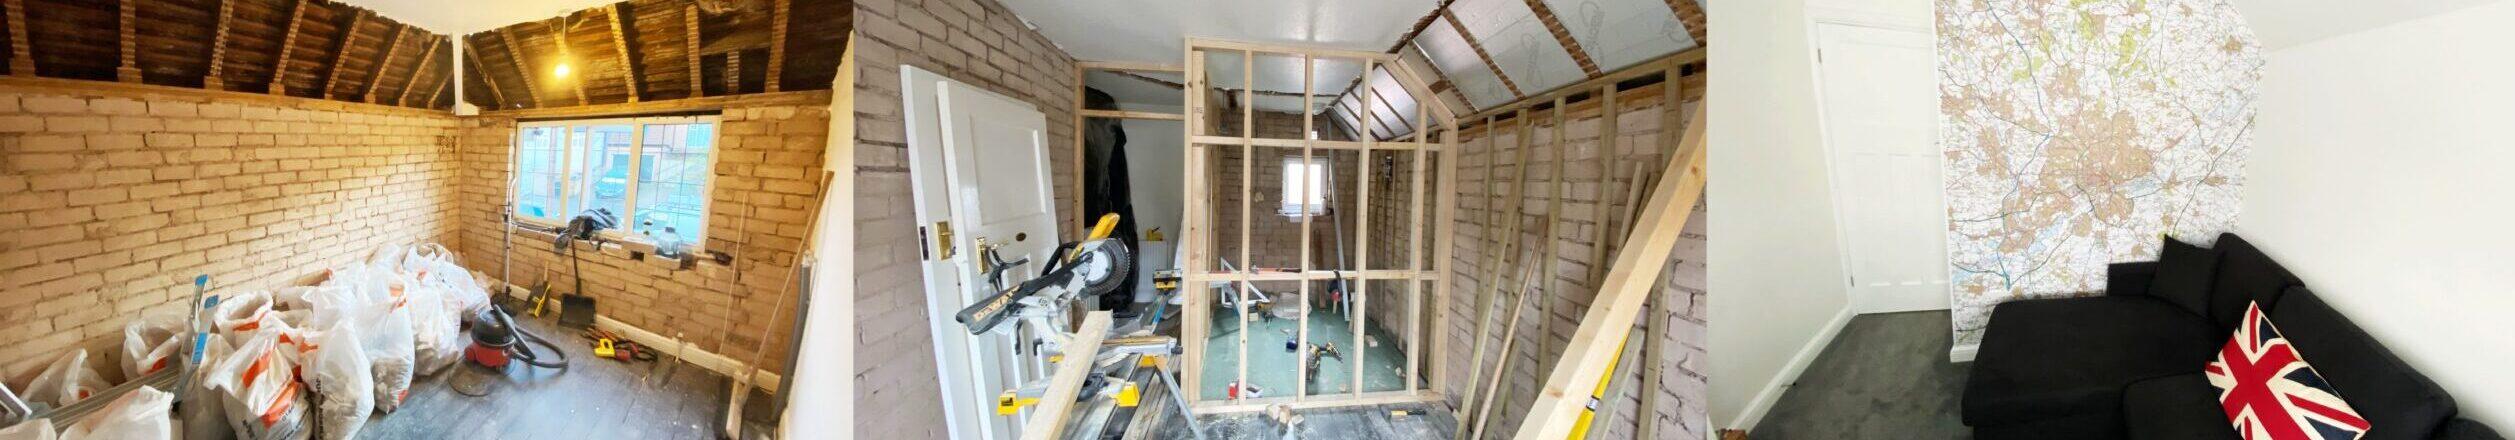 Renovations and refurbishments